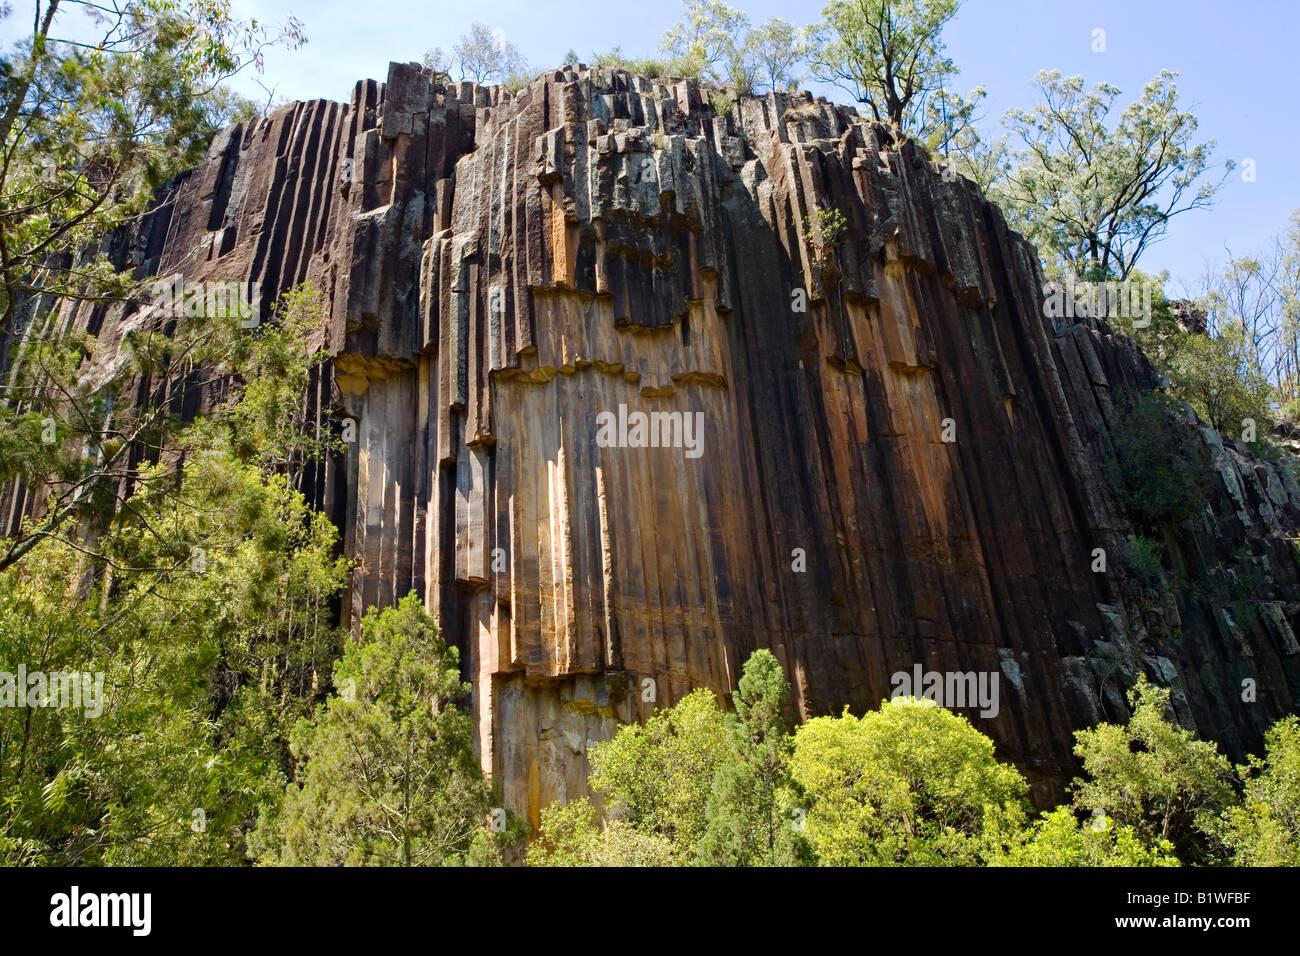 sawn-rocks-is-a-40-metre-basalt-cliff-face-featuring-perpendicular-B1WFBF.jpg